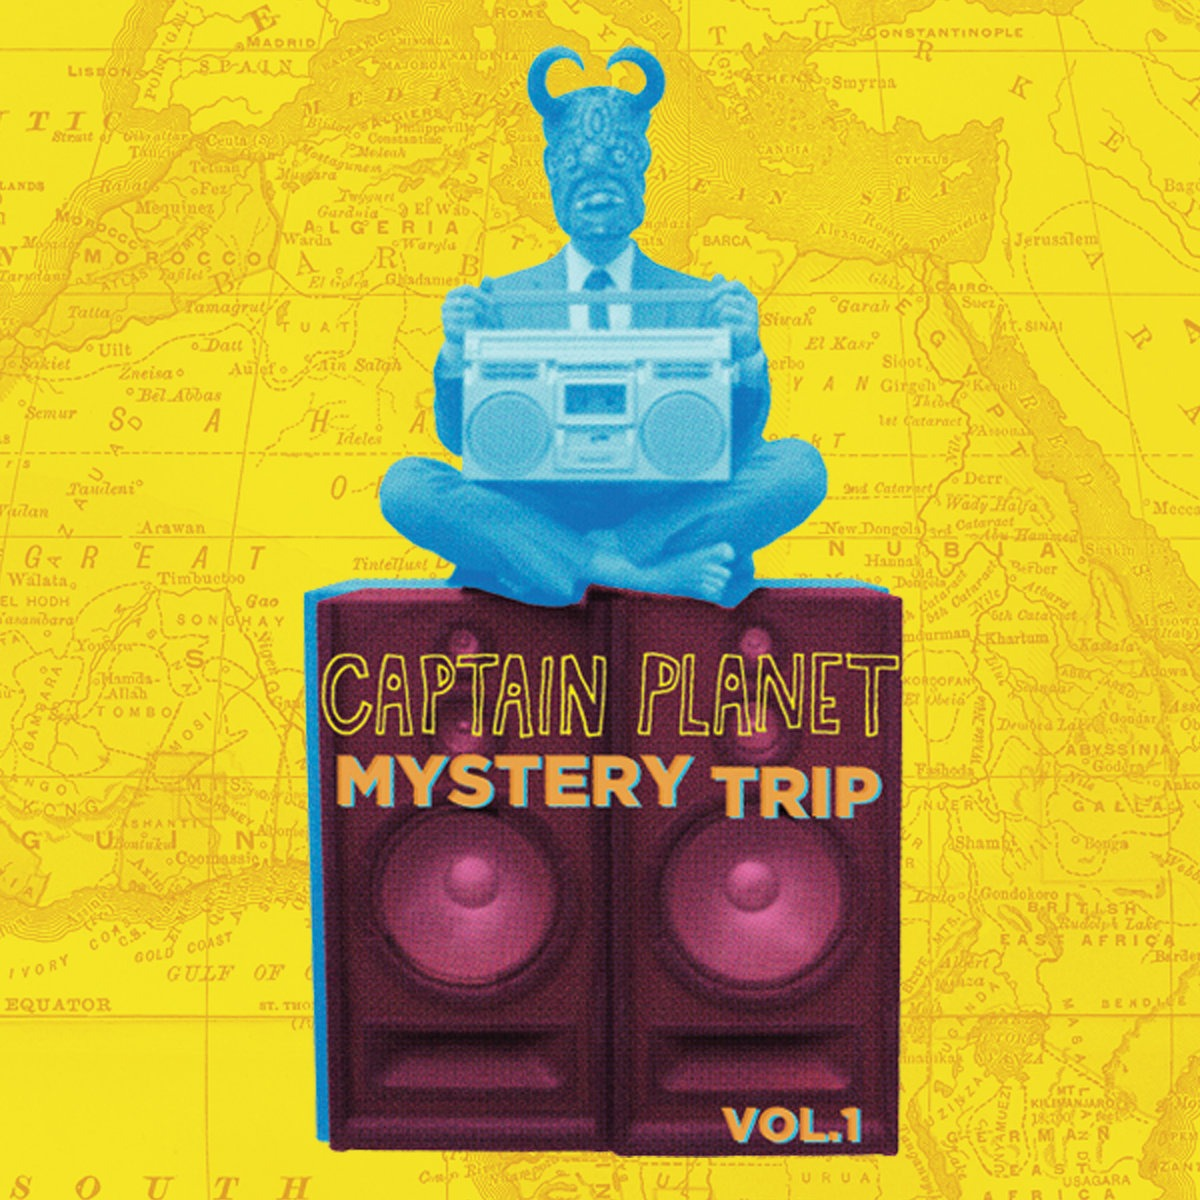 Captain Planet - Mystery Trip Vol. 1 Mixtape